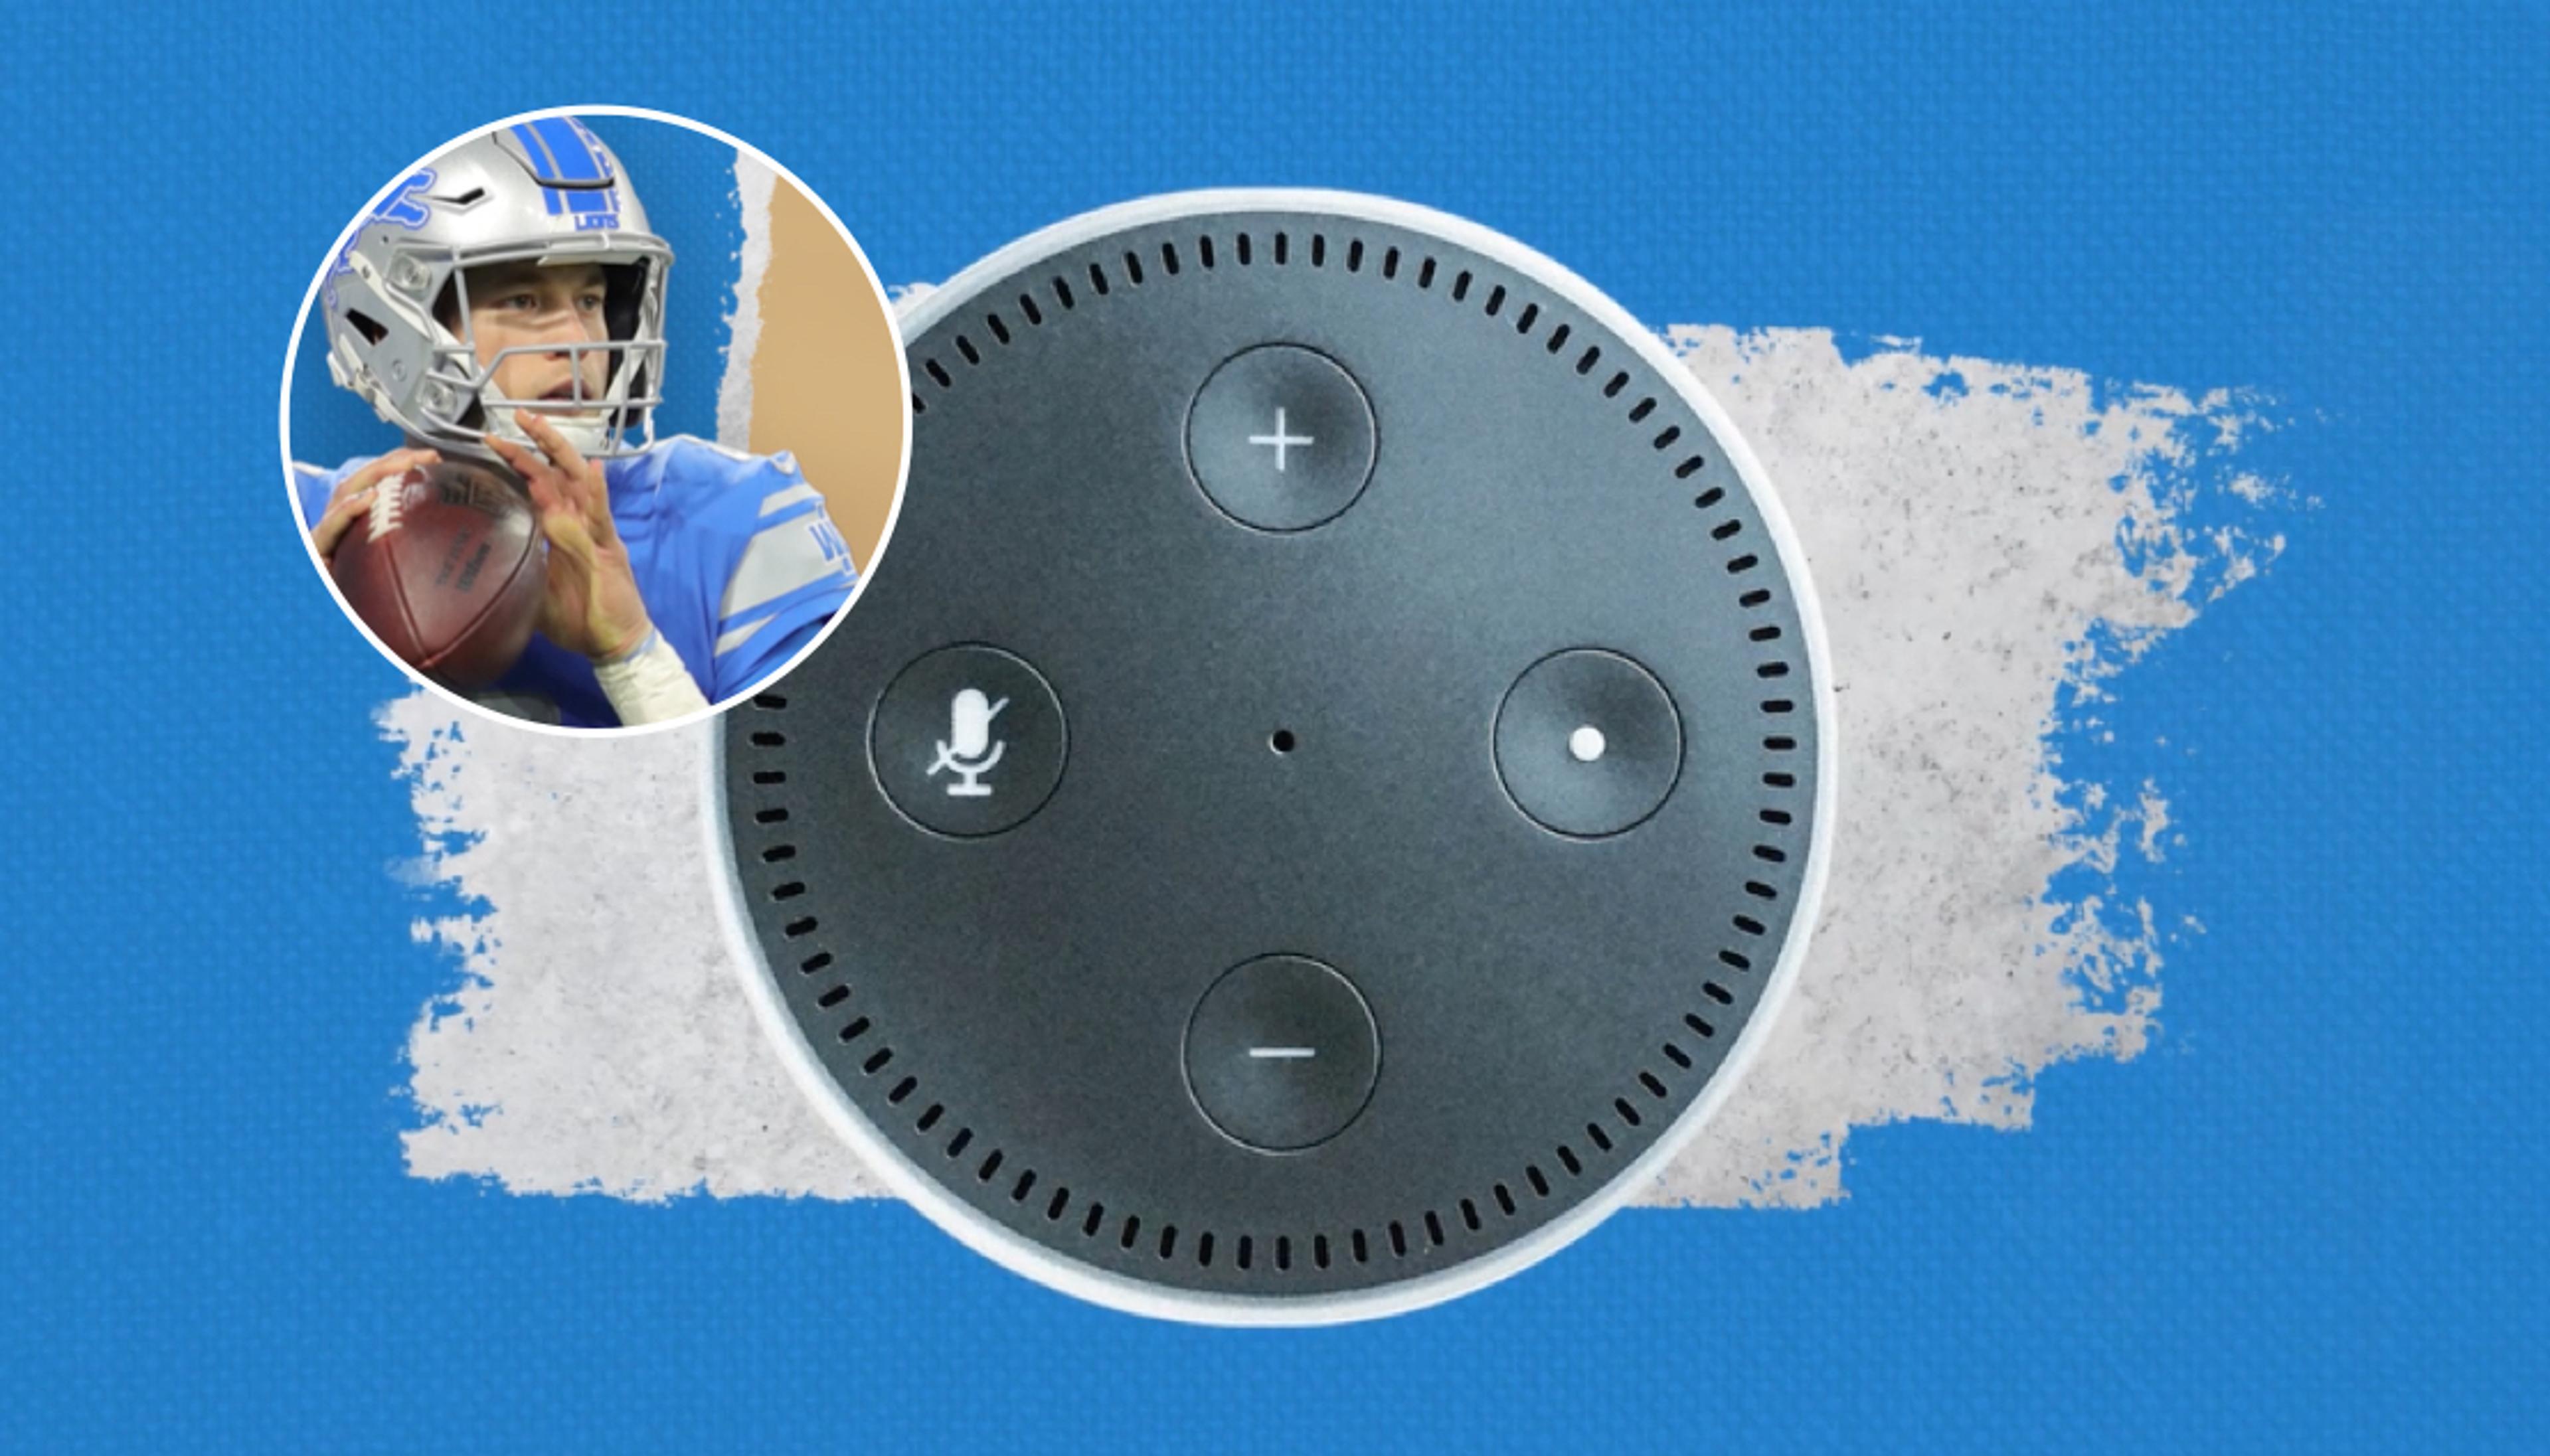 Blue Cross Blue Shield Alexa Skill with Matthew Stafford video